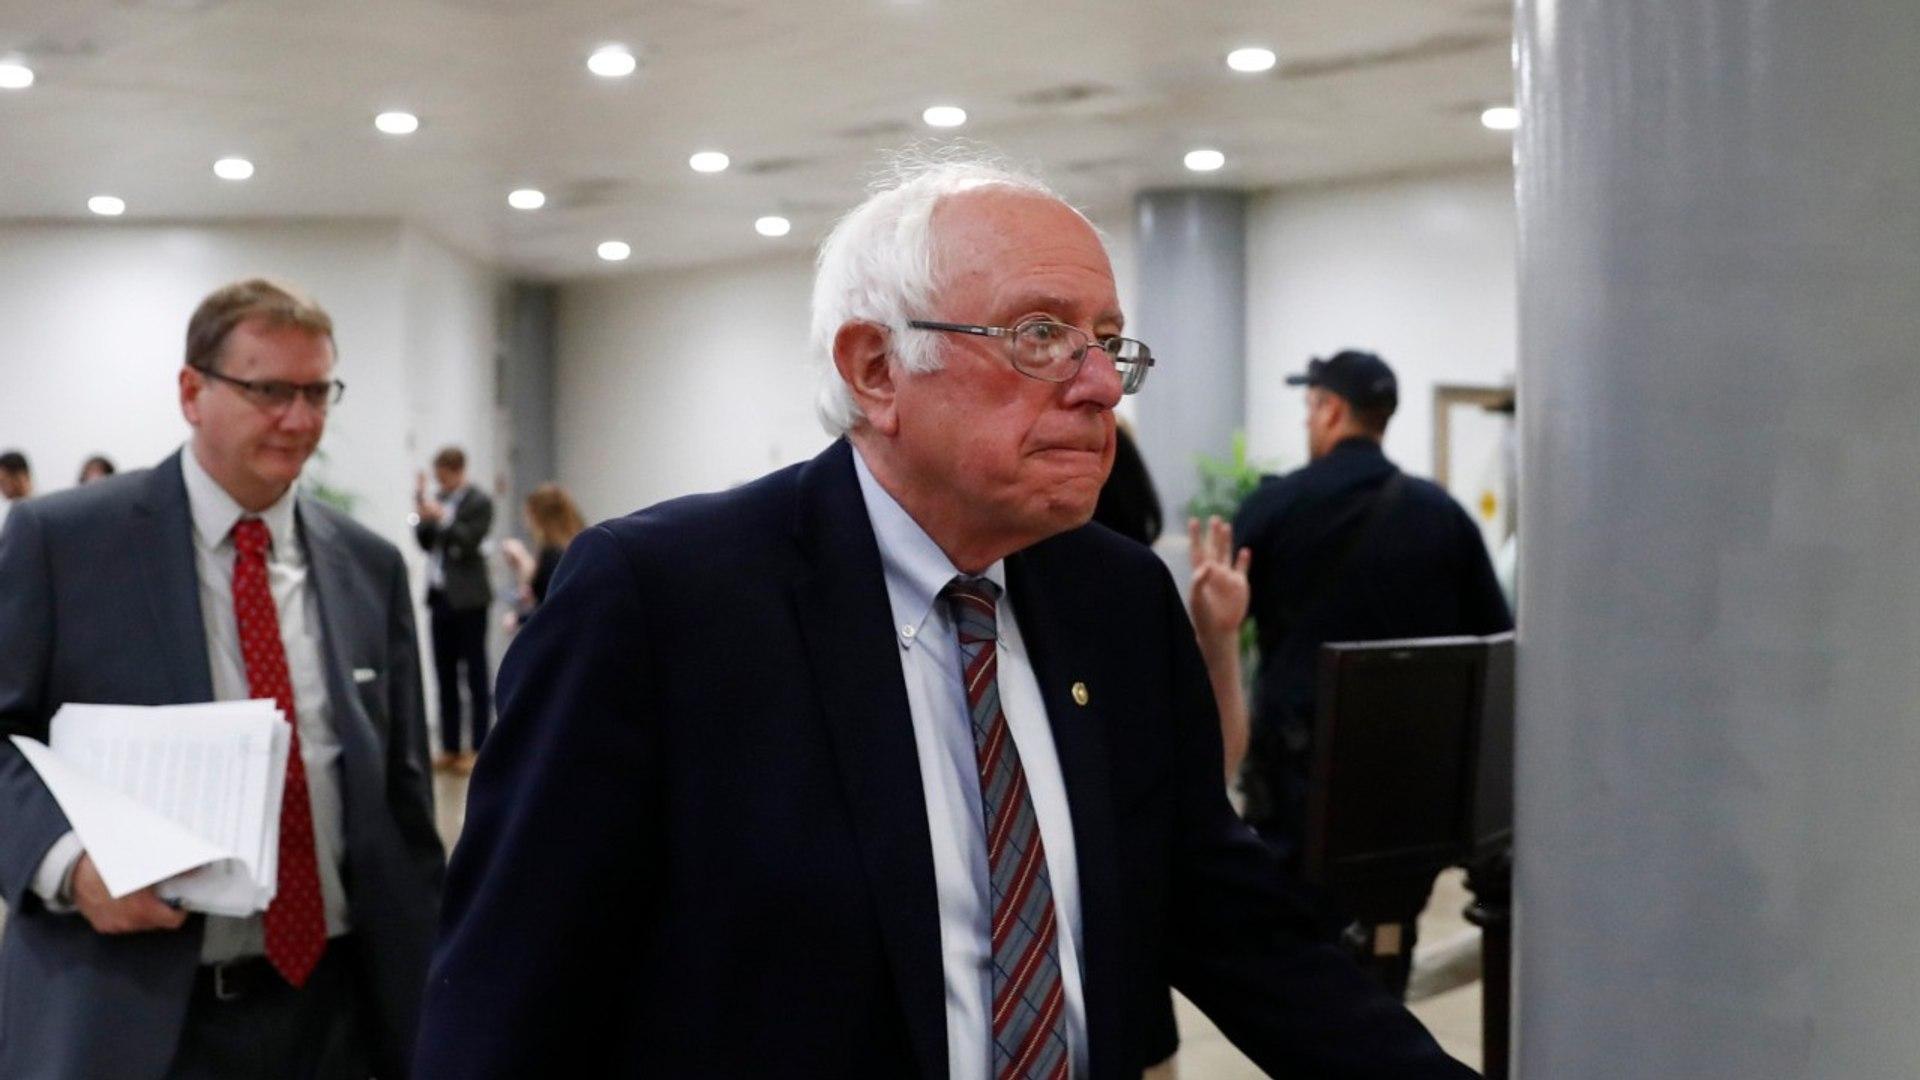 Democrats May Rally Around Bernie Sanders' Wage Raising Plan